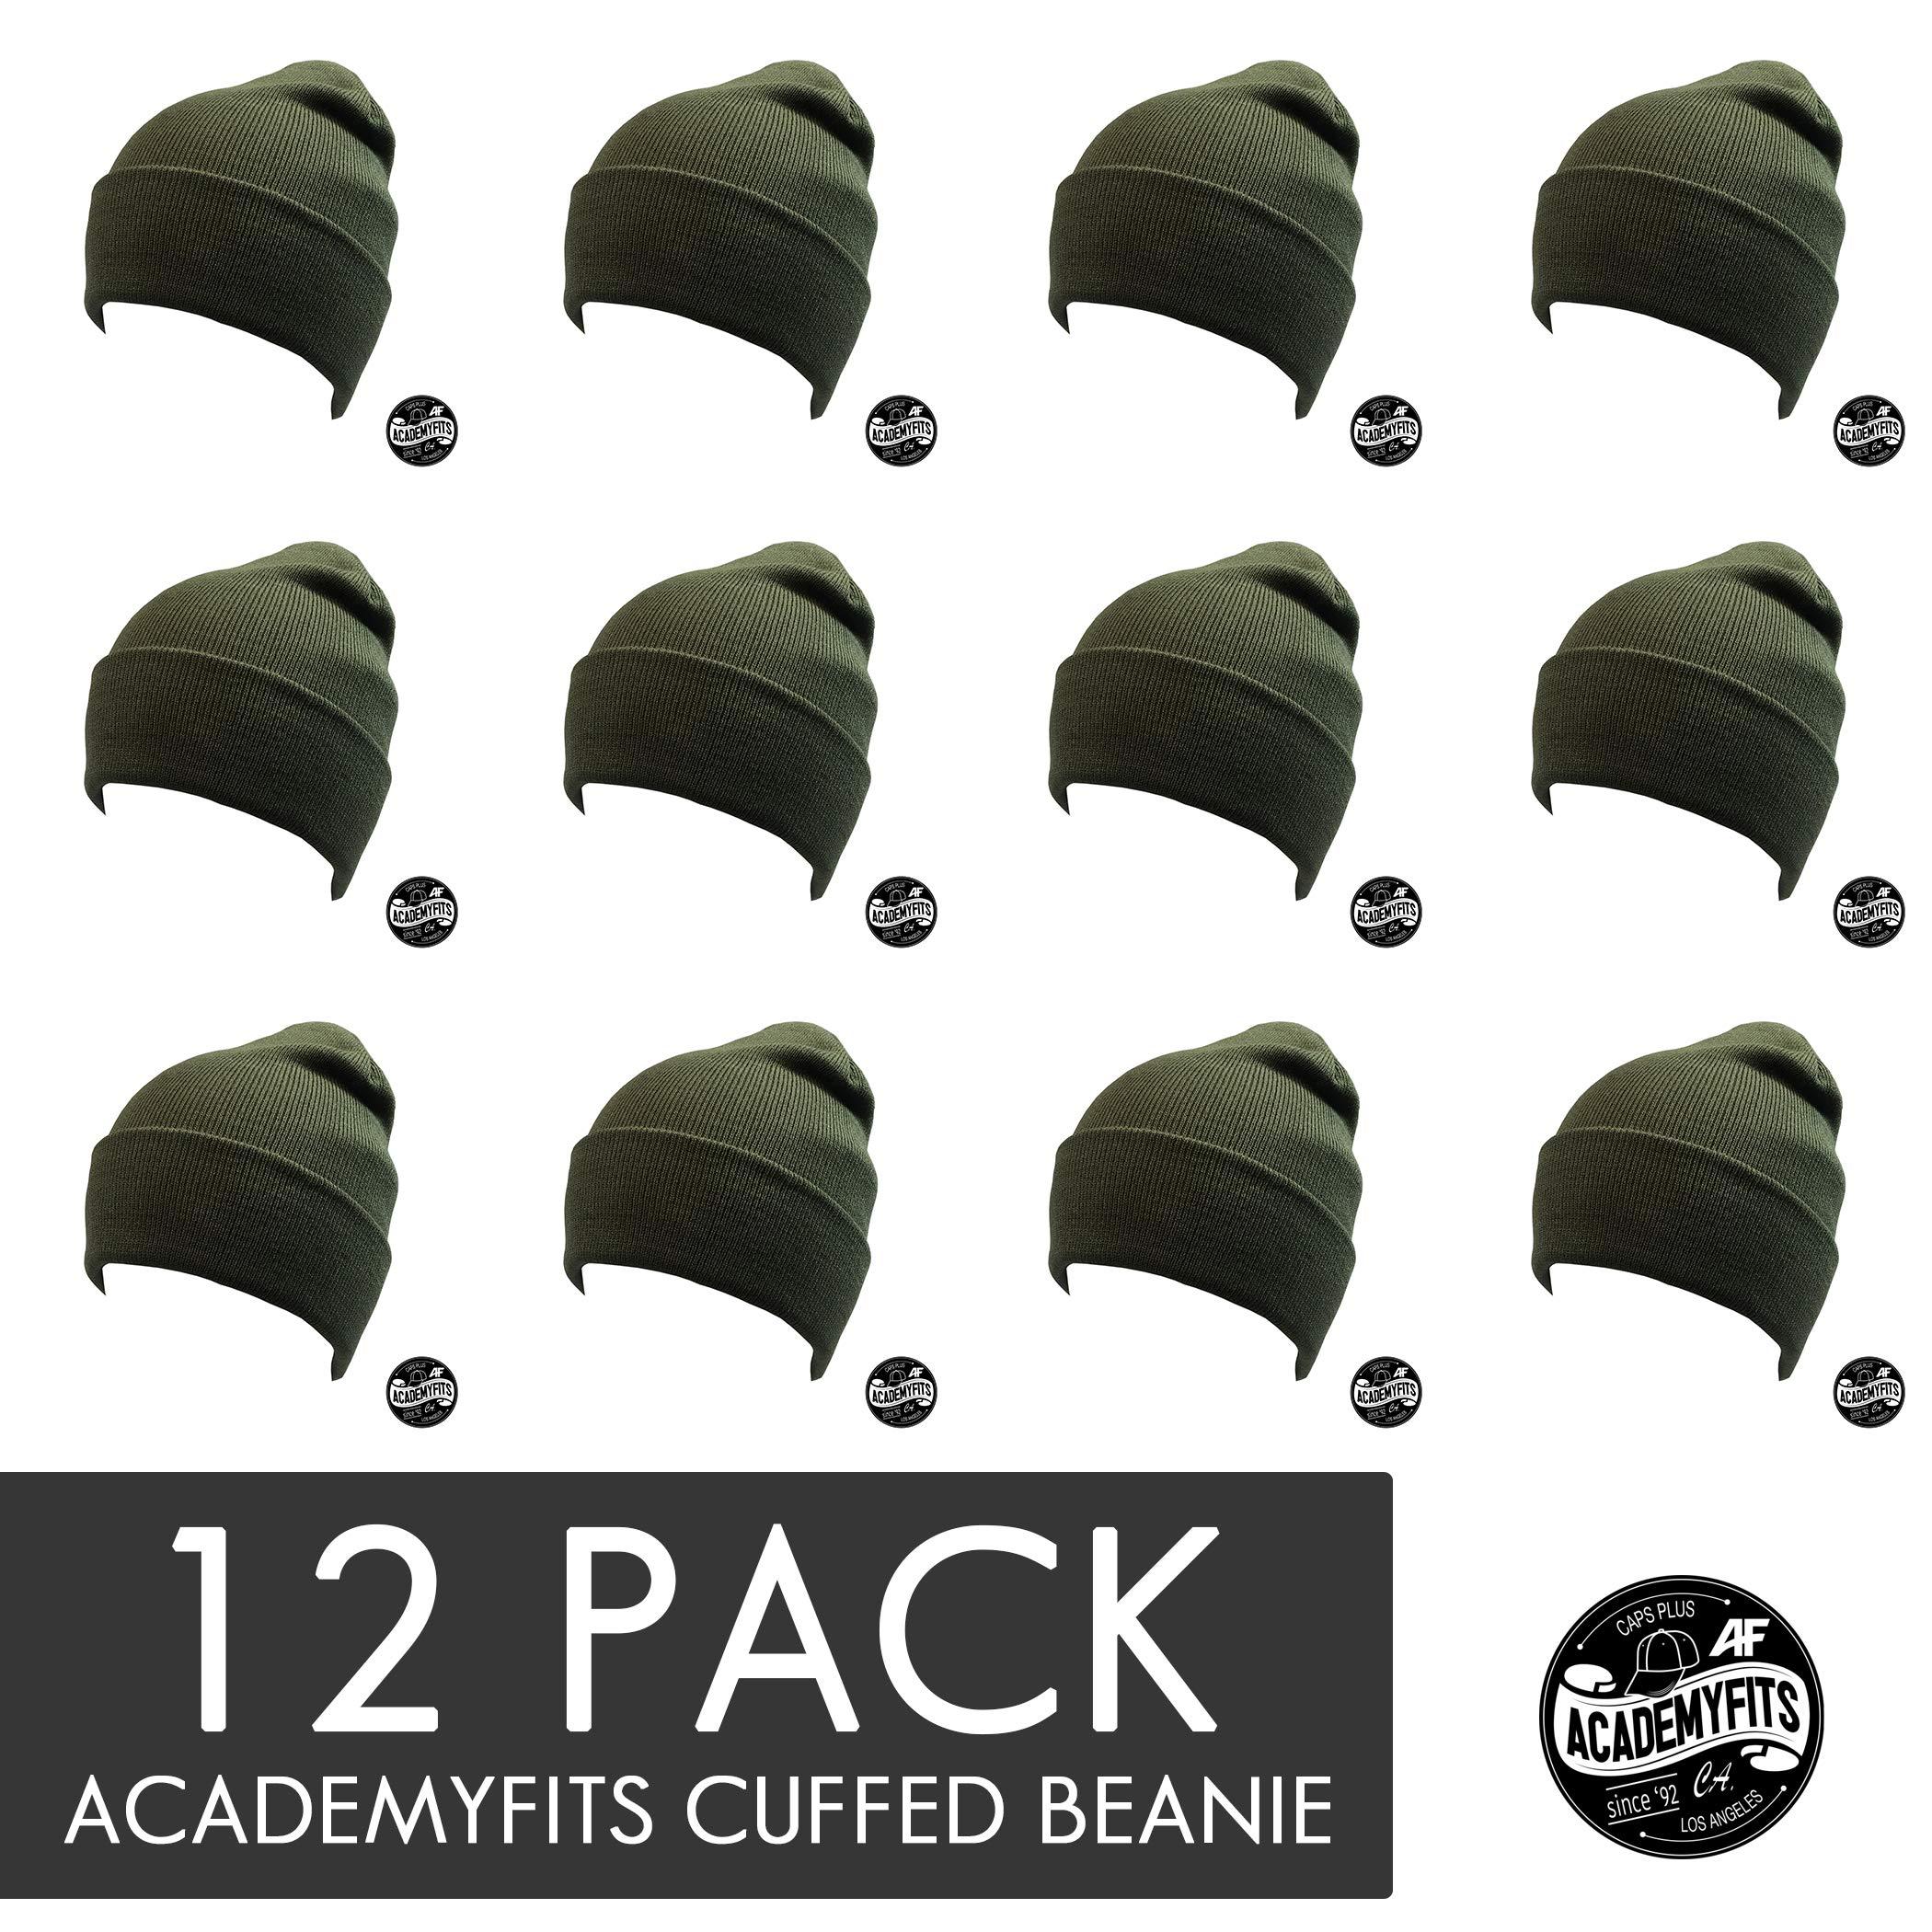 AcademyFits Quality Warm Soft Winter Cuffed 9'' Solid Beanie Hat Men Women Unisex Cap Wholesale 12 Pack Lot (Olive (12))